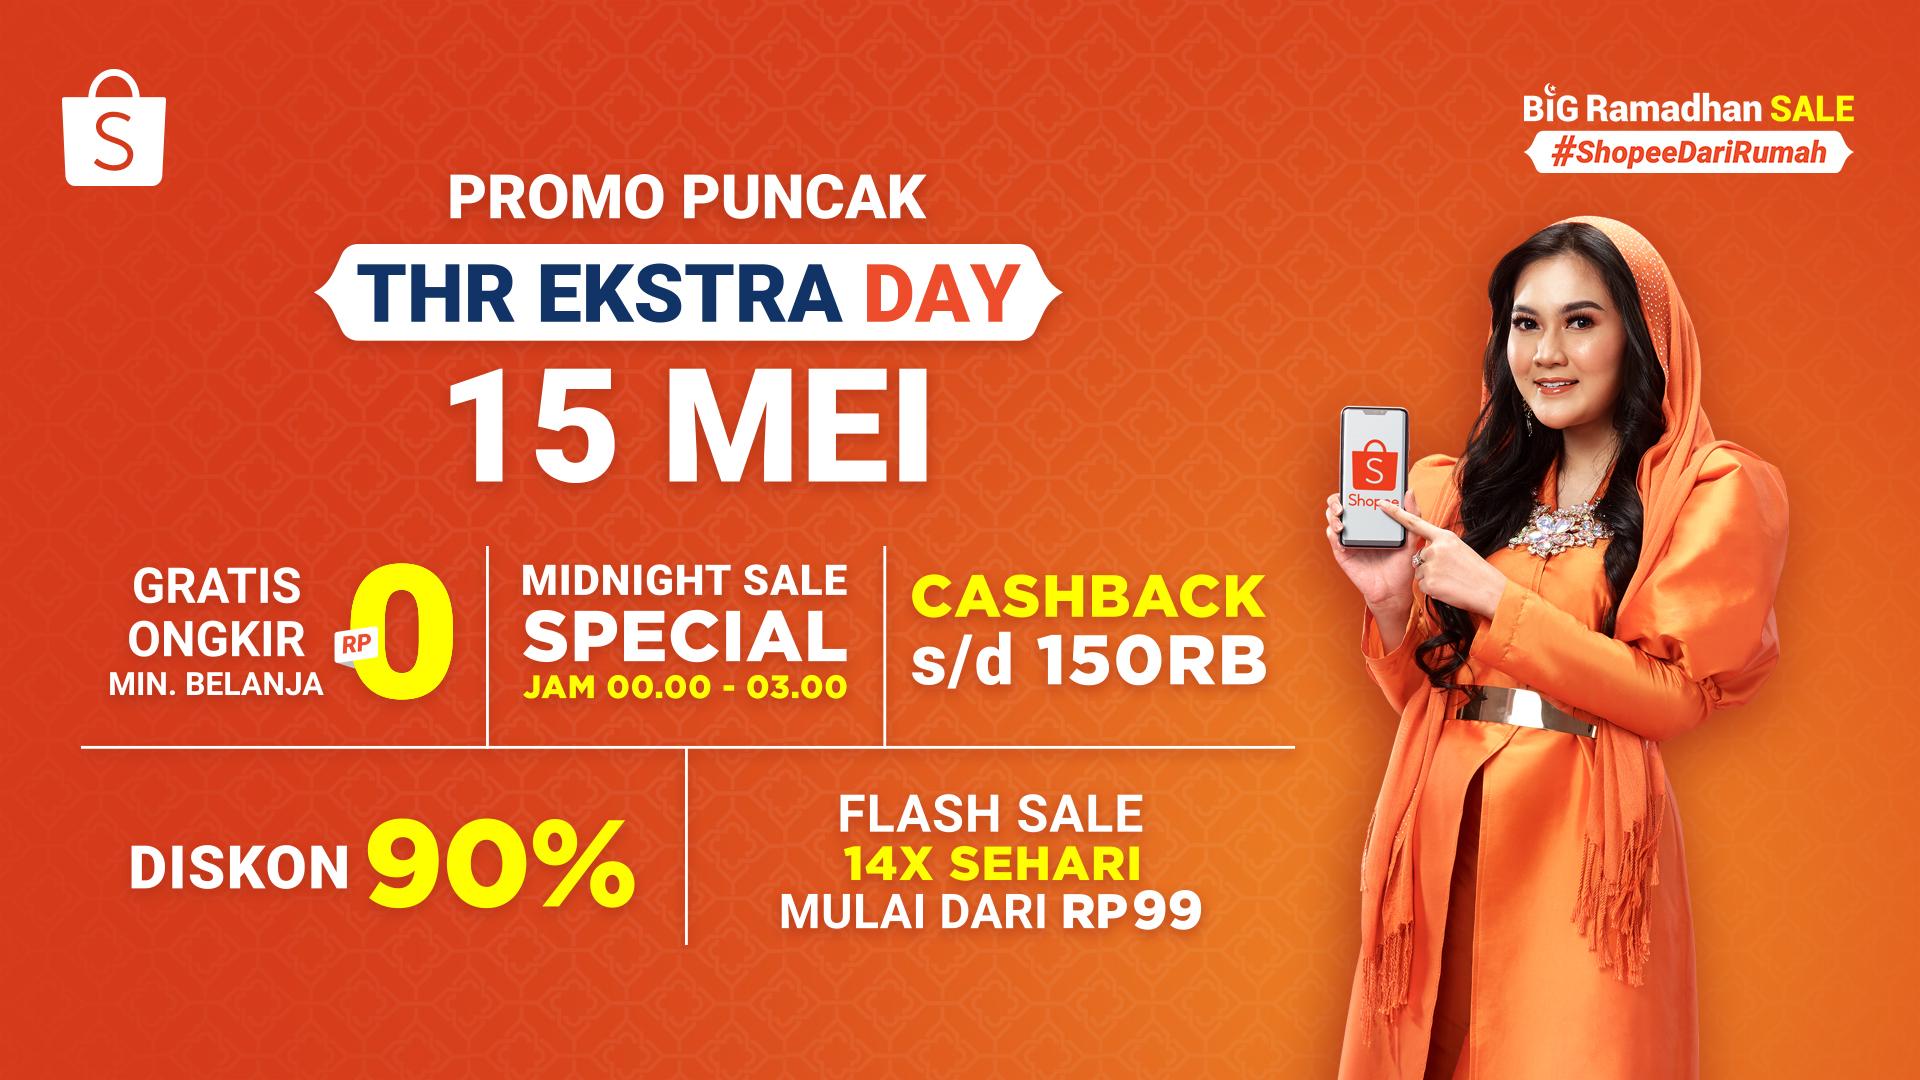 Spesial 15 Mei, Promo Heboh Puncak THR Ekstra Day dari Shopee!